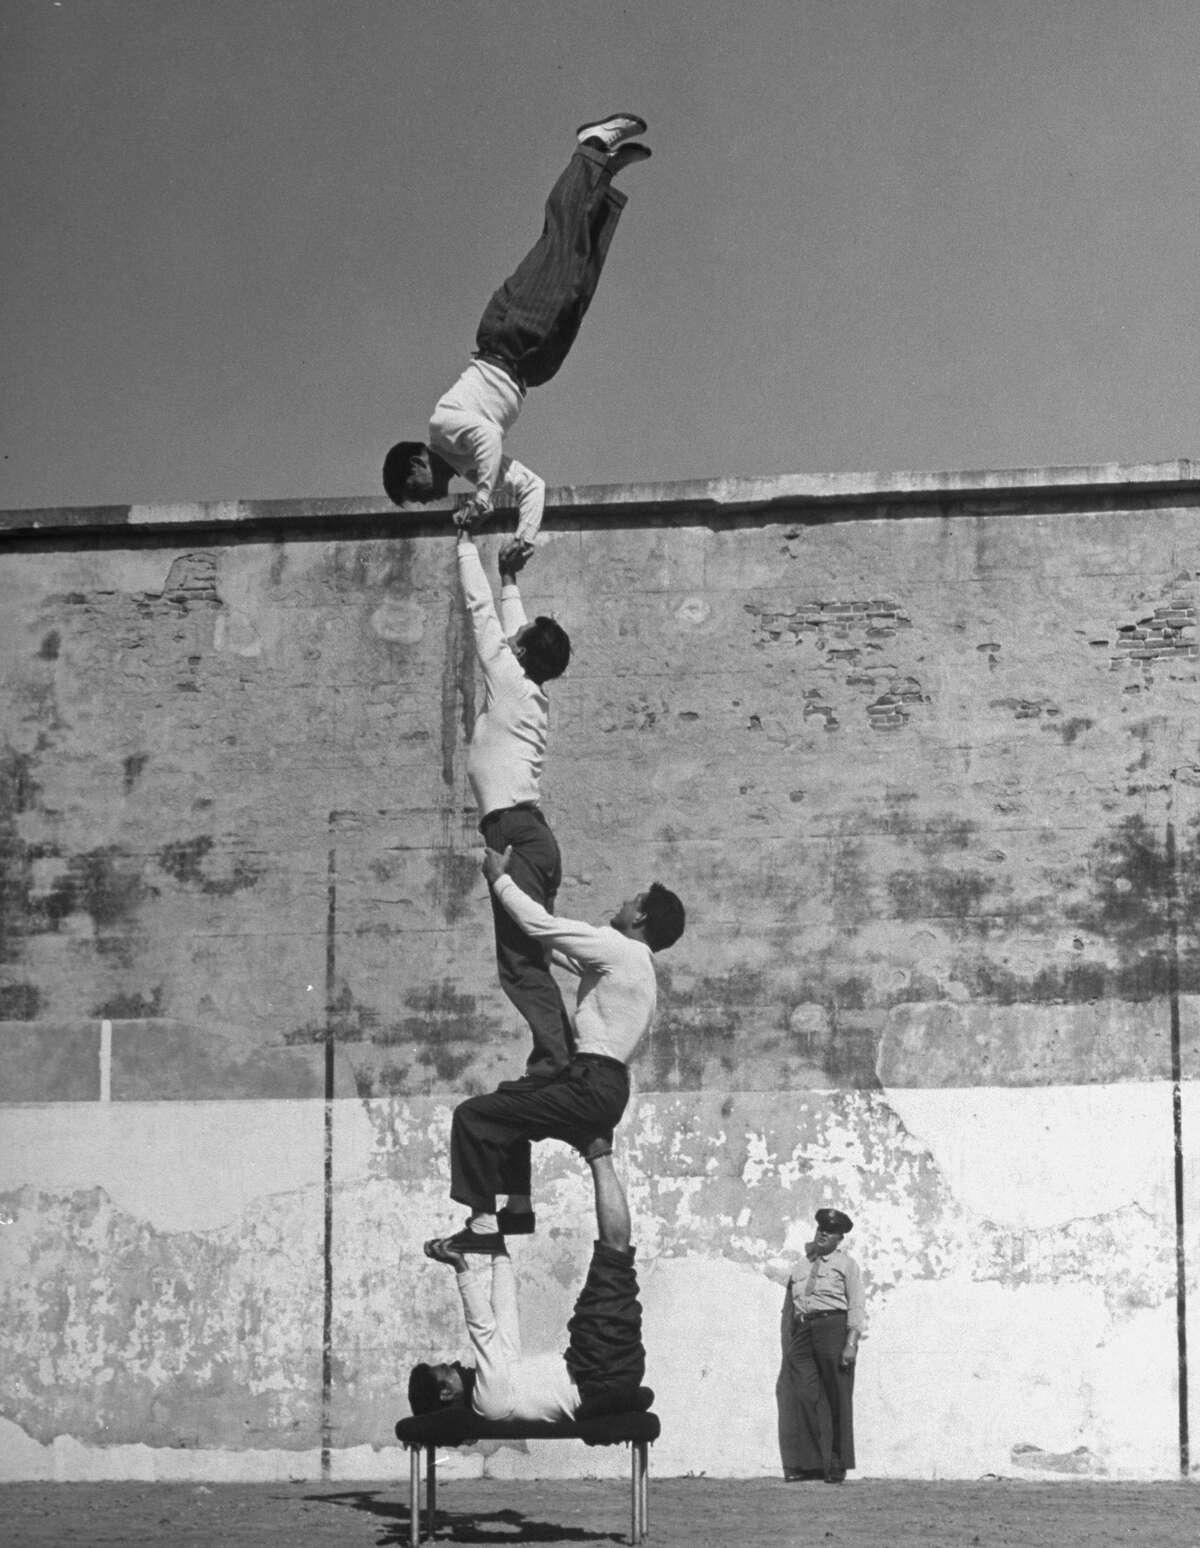 Prisoners doing gymnastics at San Quentin Prison, 1947.